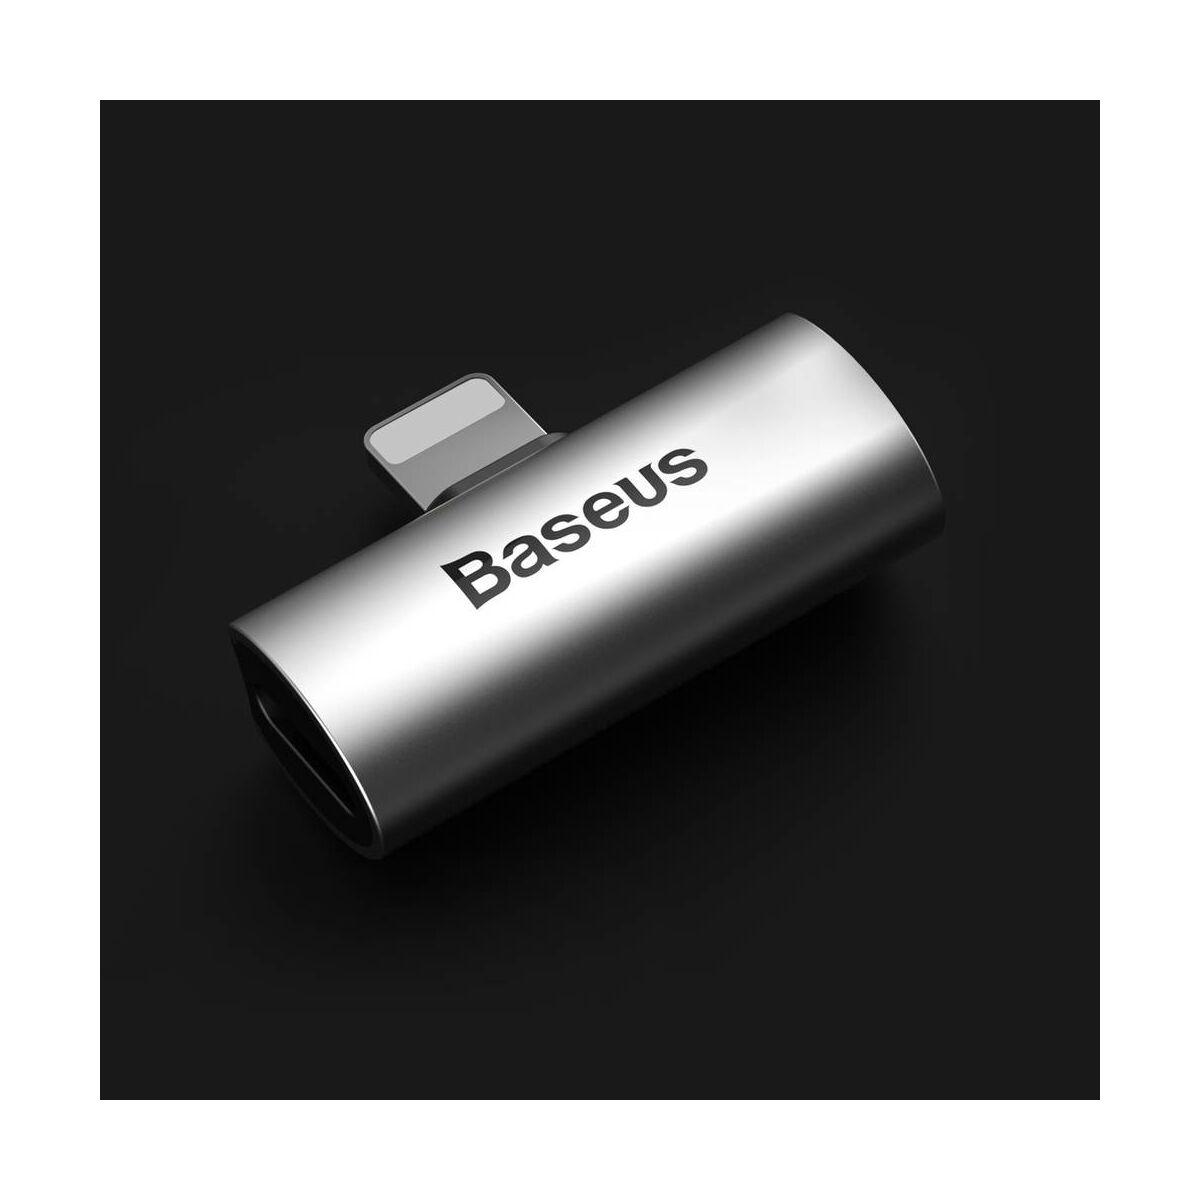 Baseus átalakító, L46 Lightning [apa] - Dual Lightning [anya] adapter, ezüst/fekete (CAL46-S1)